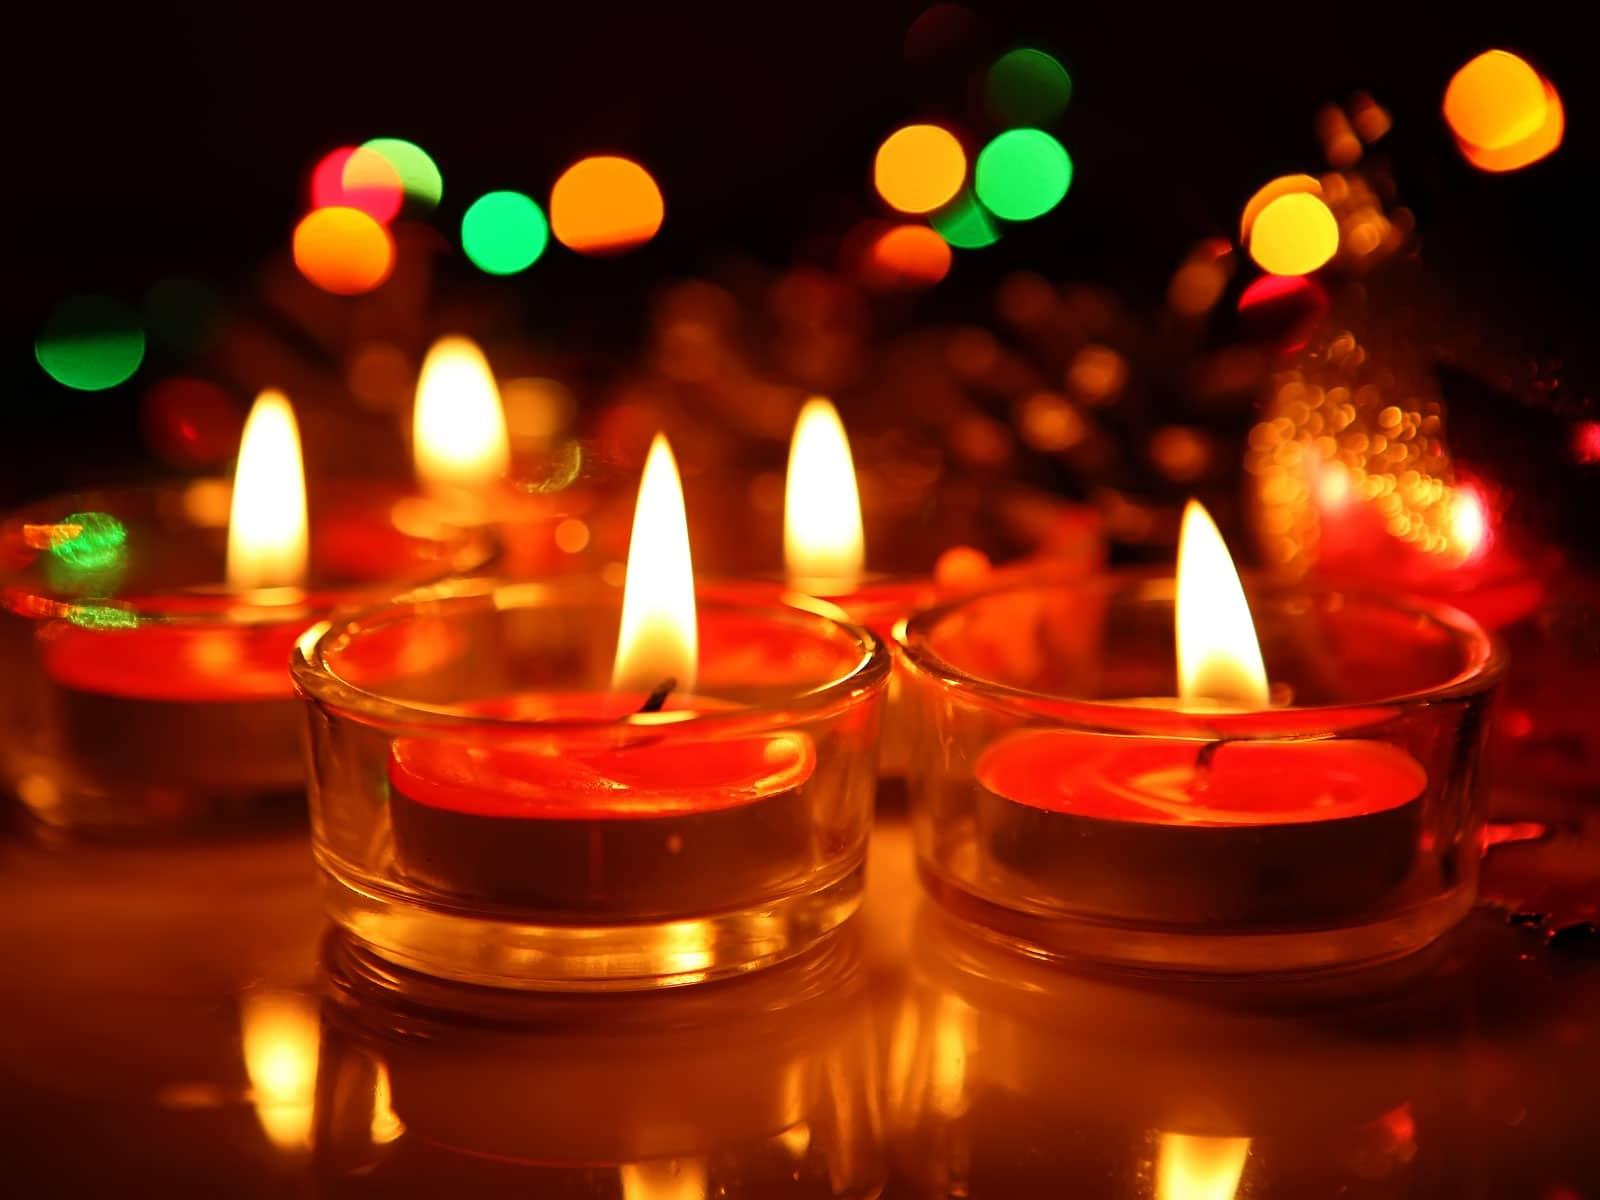 diwali wishes - be good